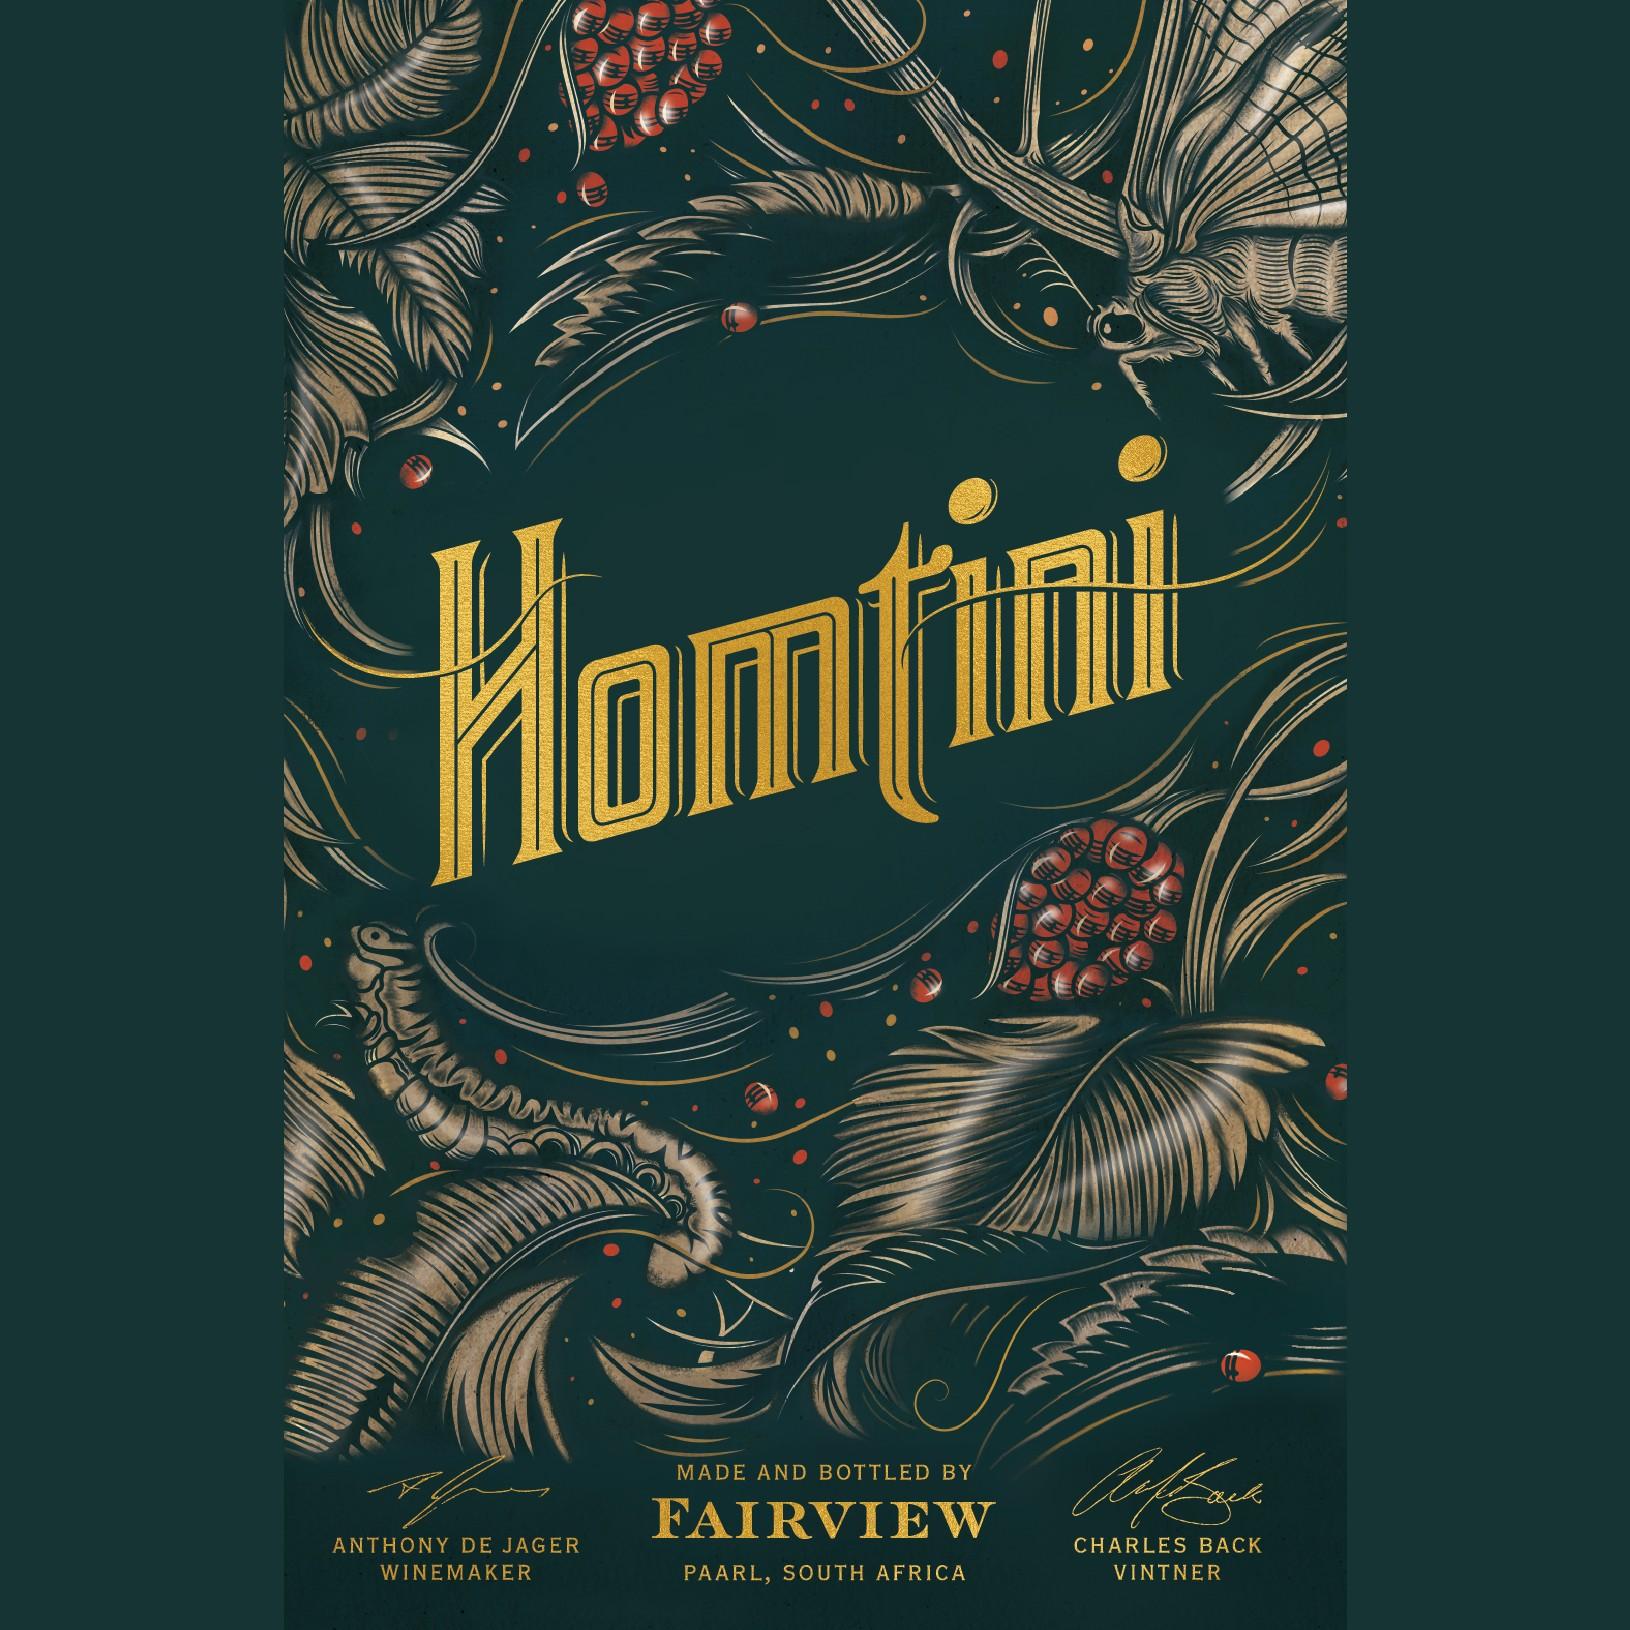 HOMTINI_FRONT-01.jpg